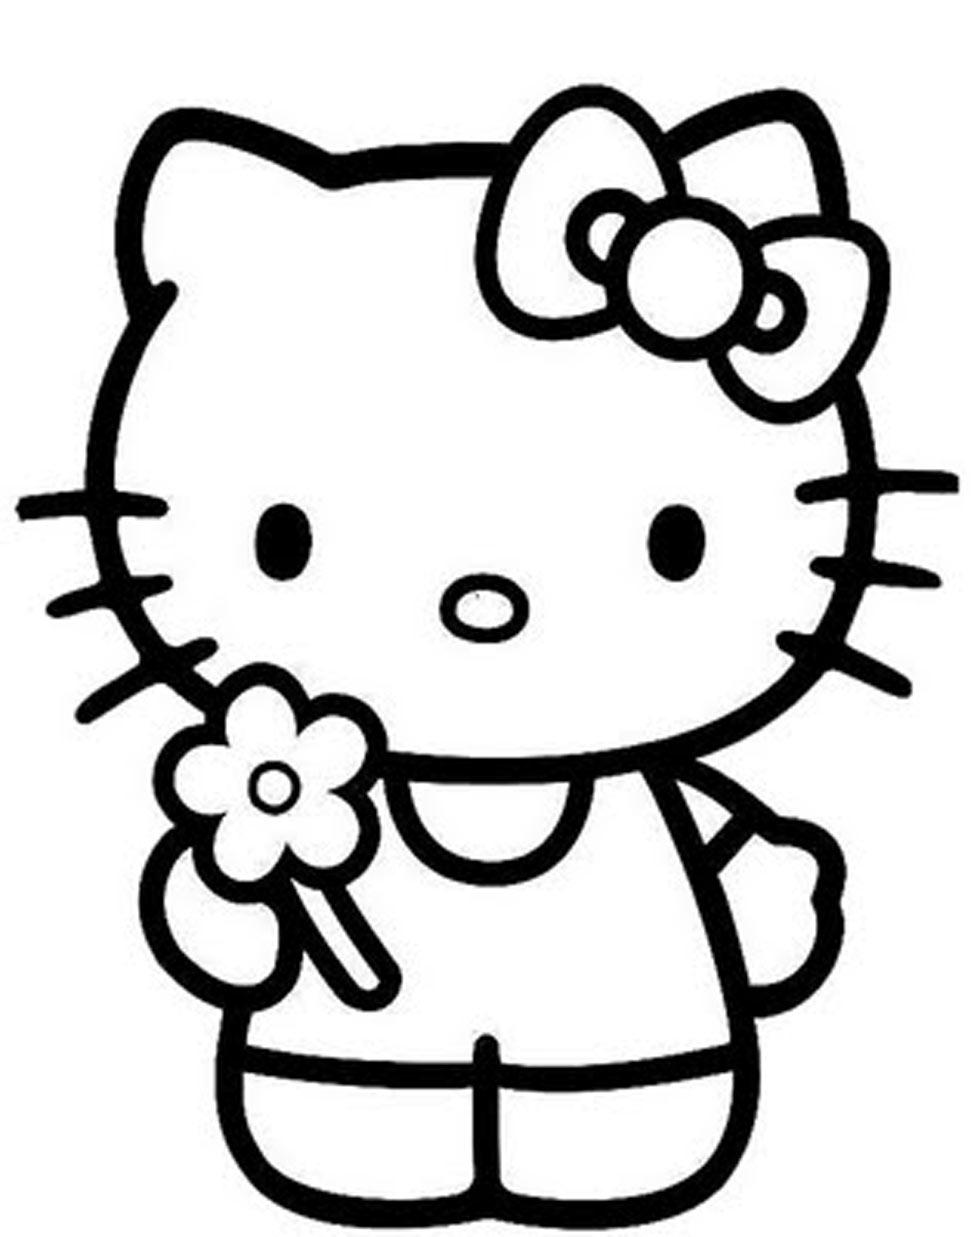 Coloriages A Imprimer Hello Kitty Numero 17750